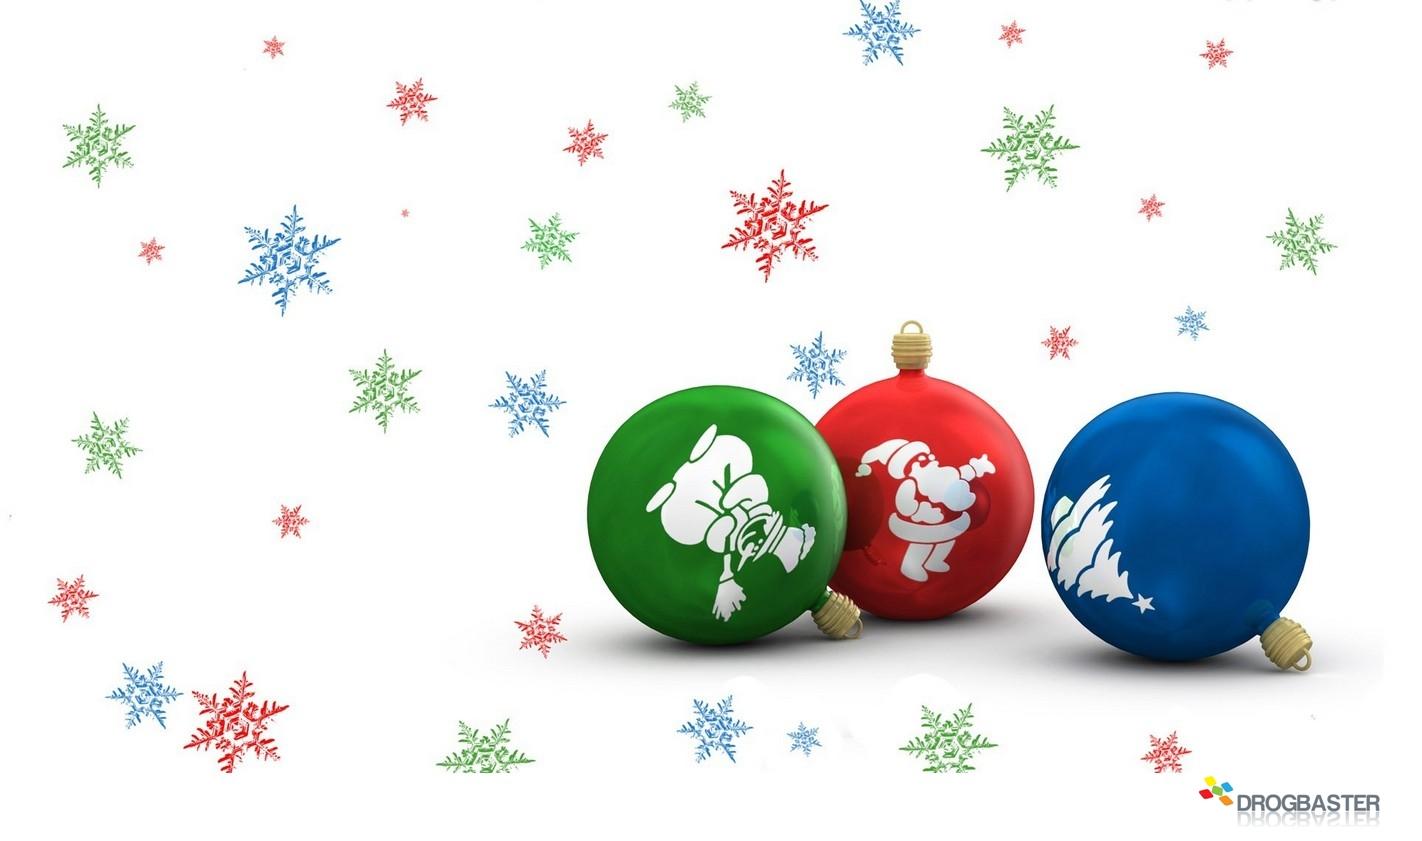 Sfondi wallpapers tema natalizio sfondi di natale gratis for Christmas theme design